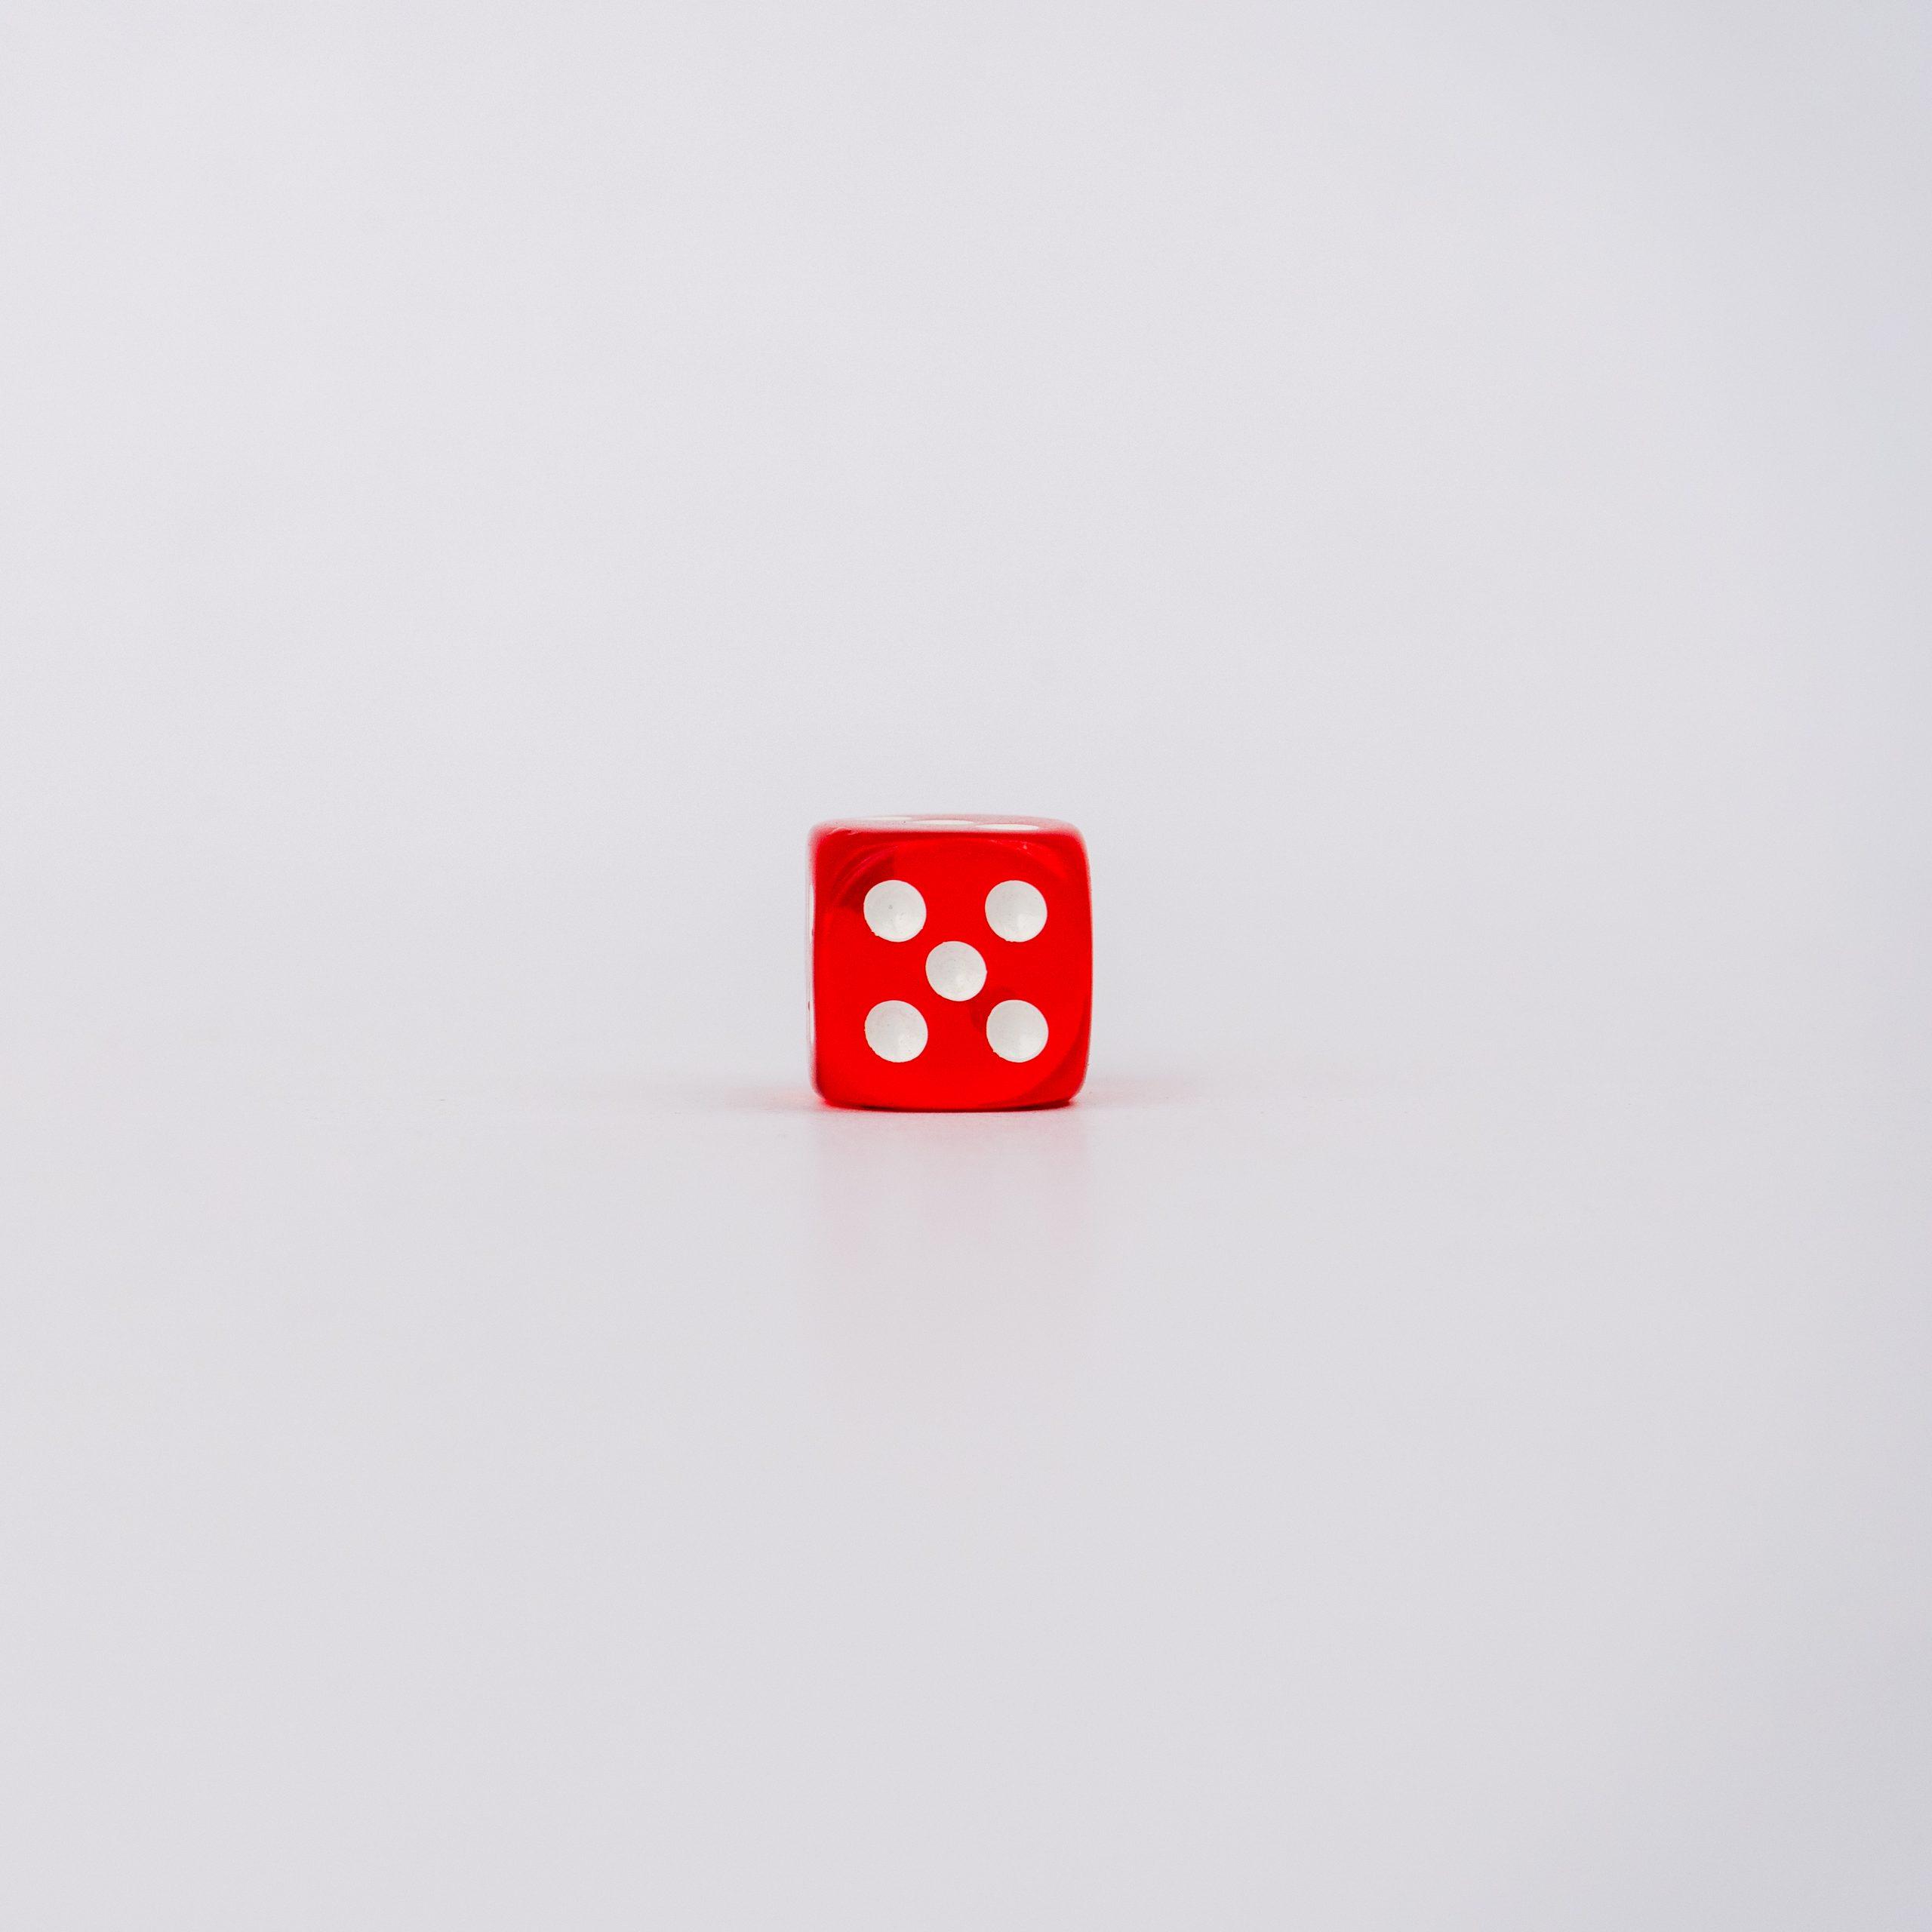 Five on dice